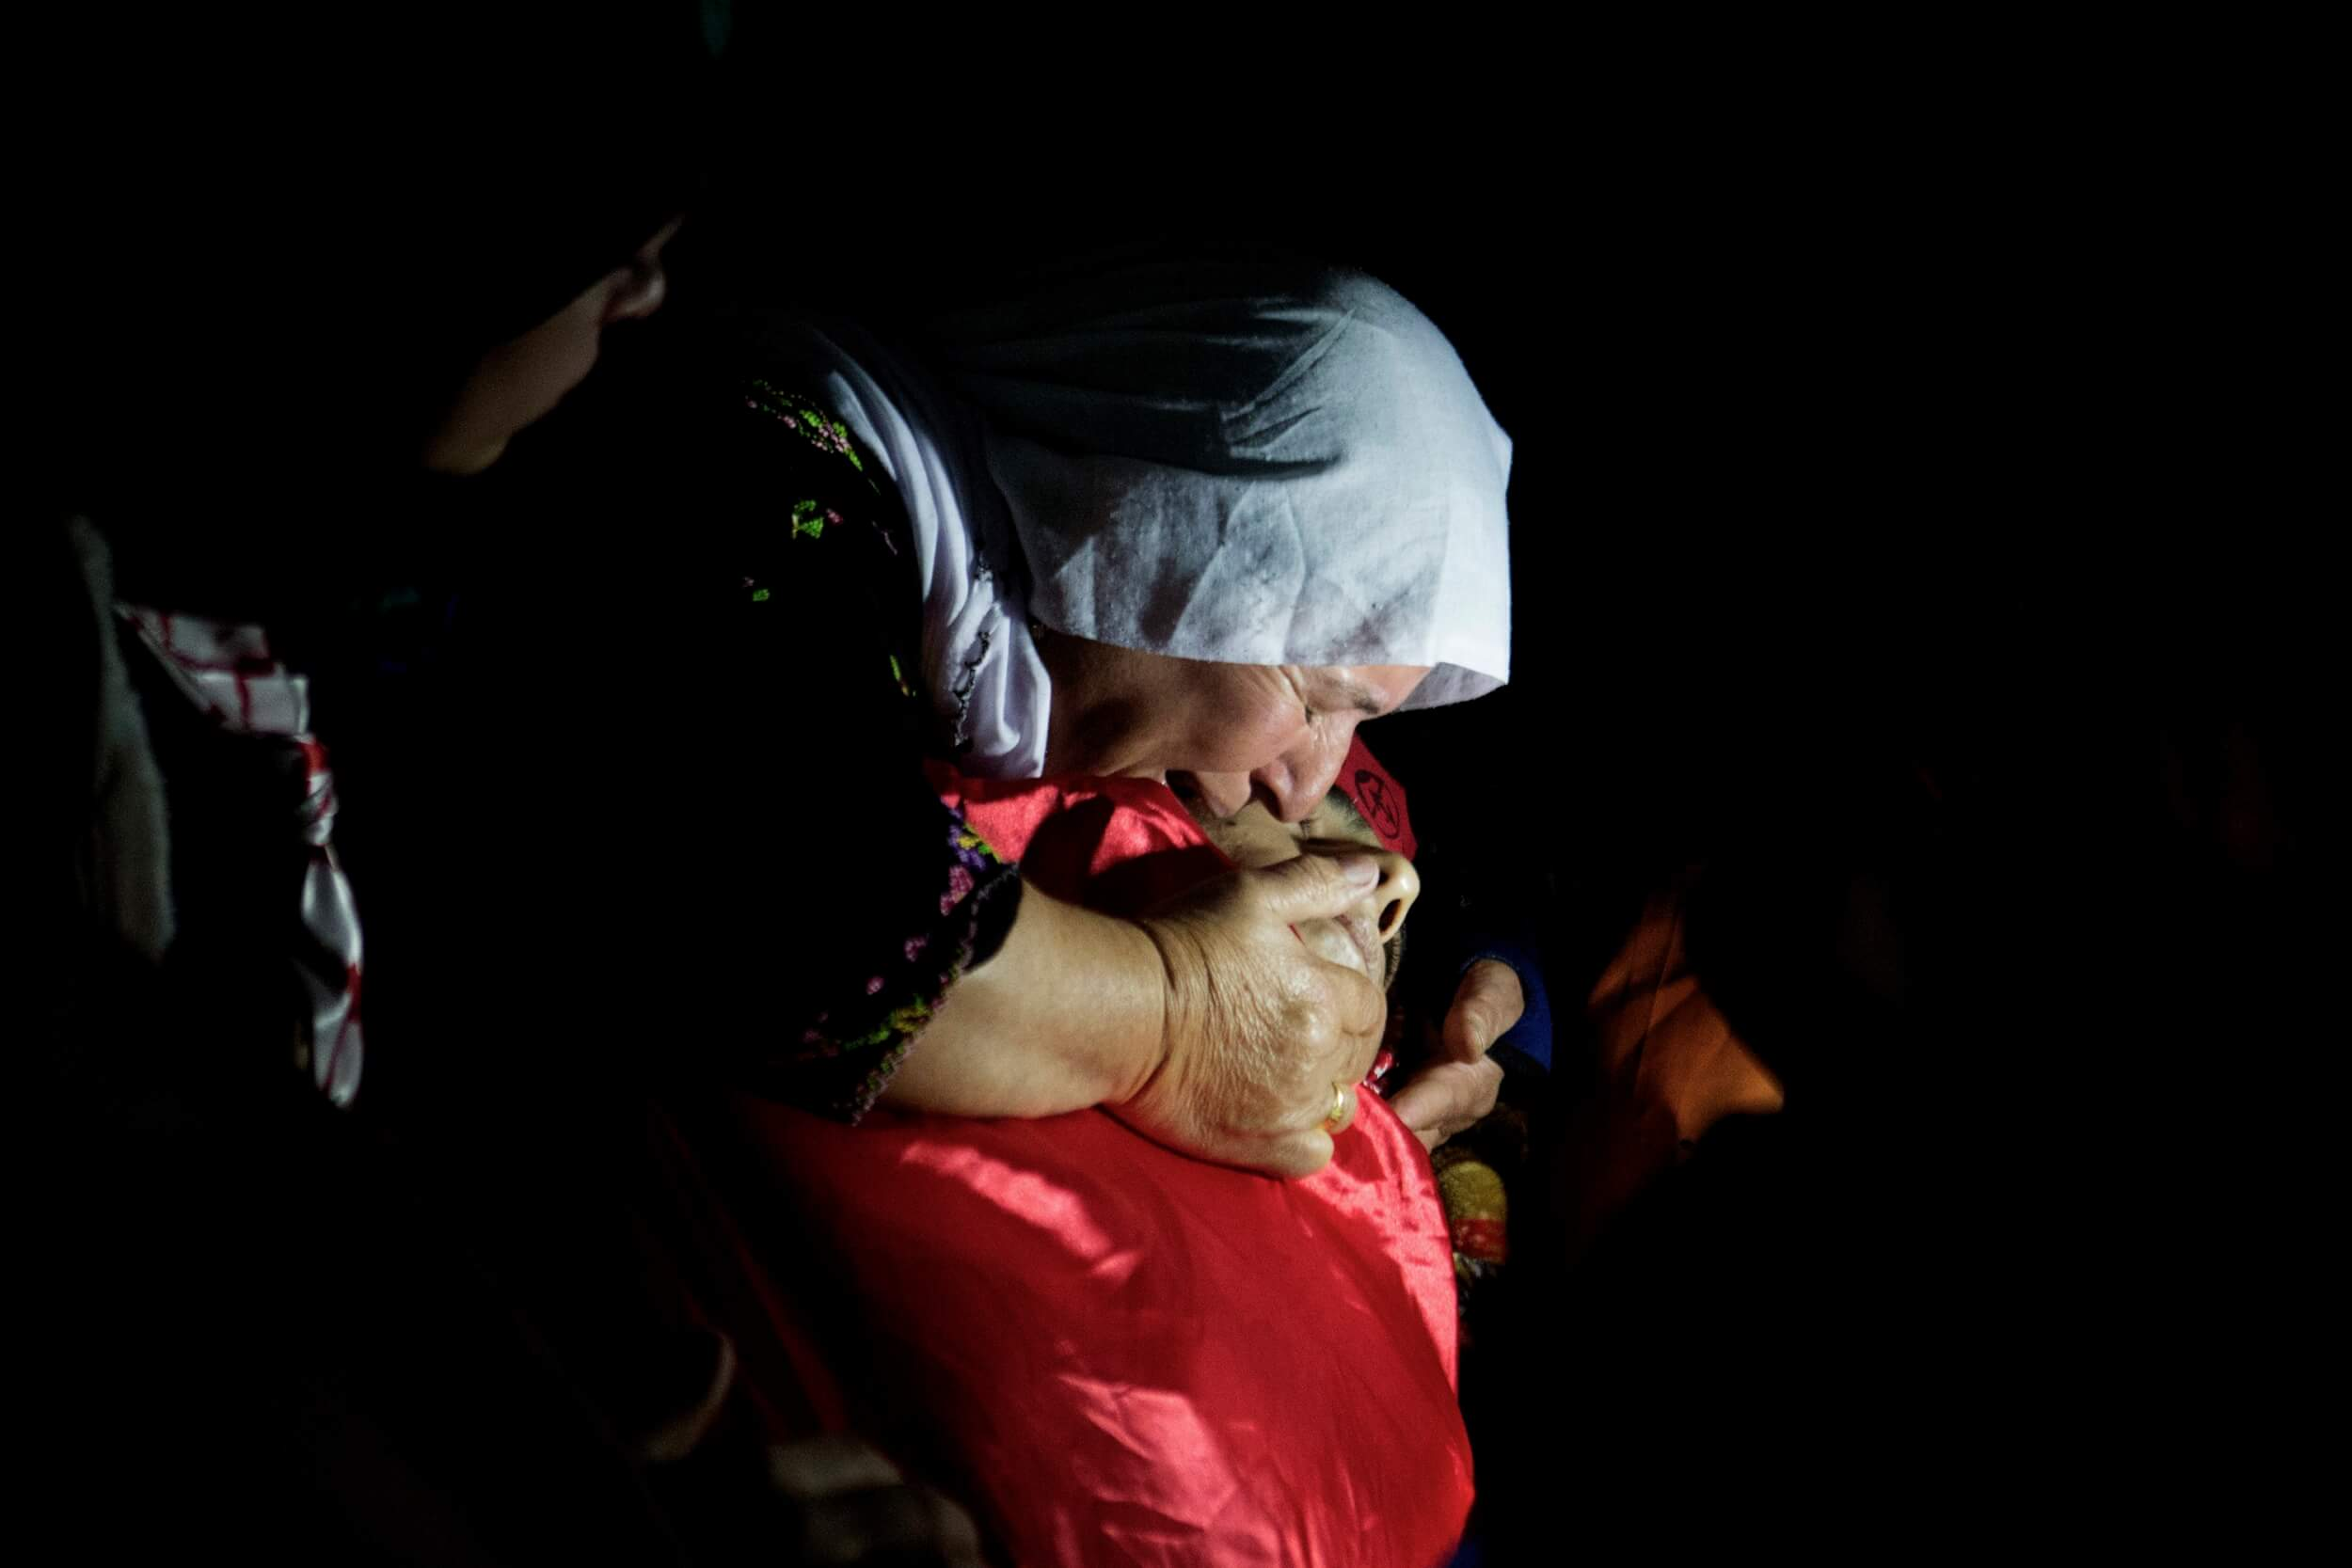 A relative says goodbye to Khalid Mahmoud al-Jawabreh in Bethlehem, photo by Anne Paq